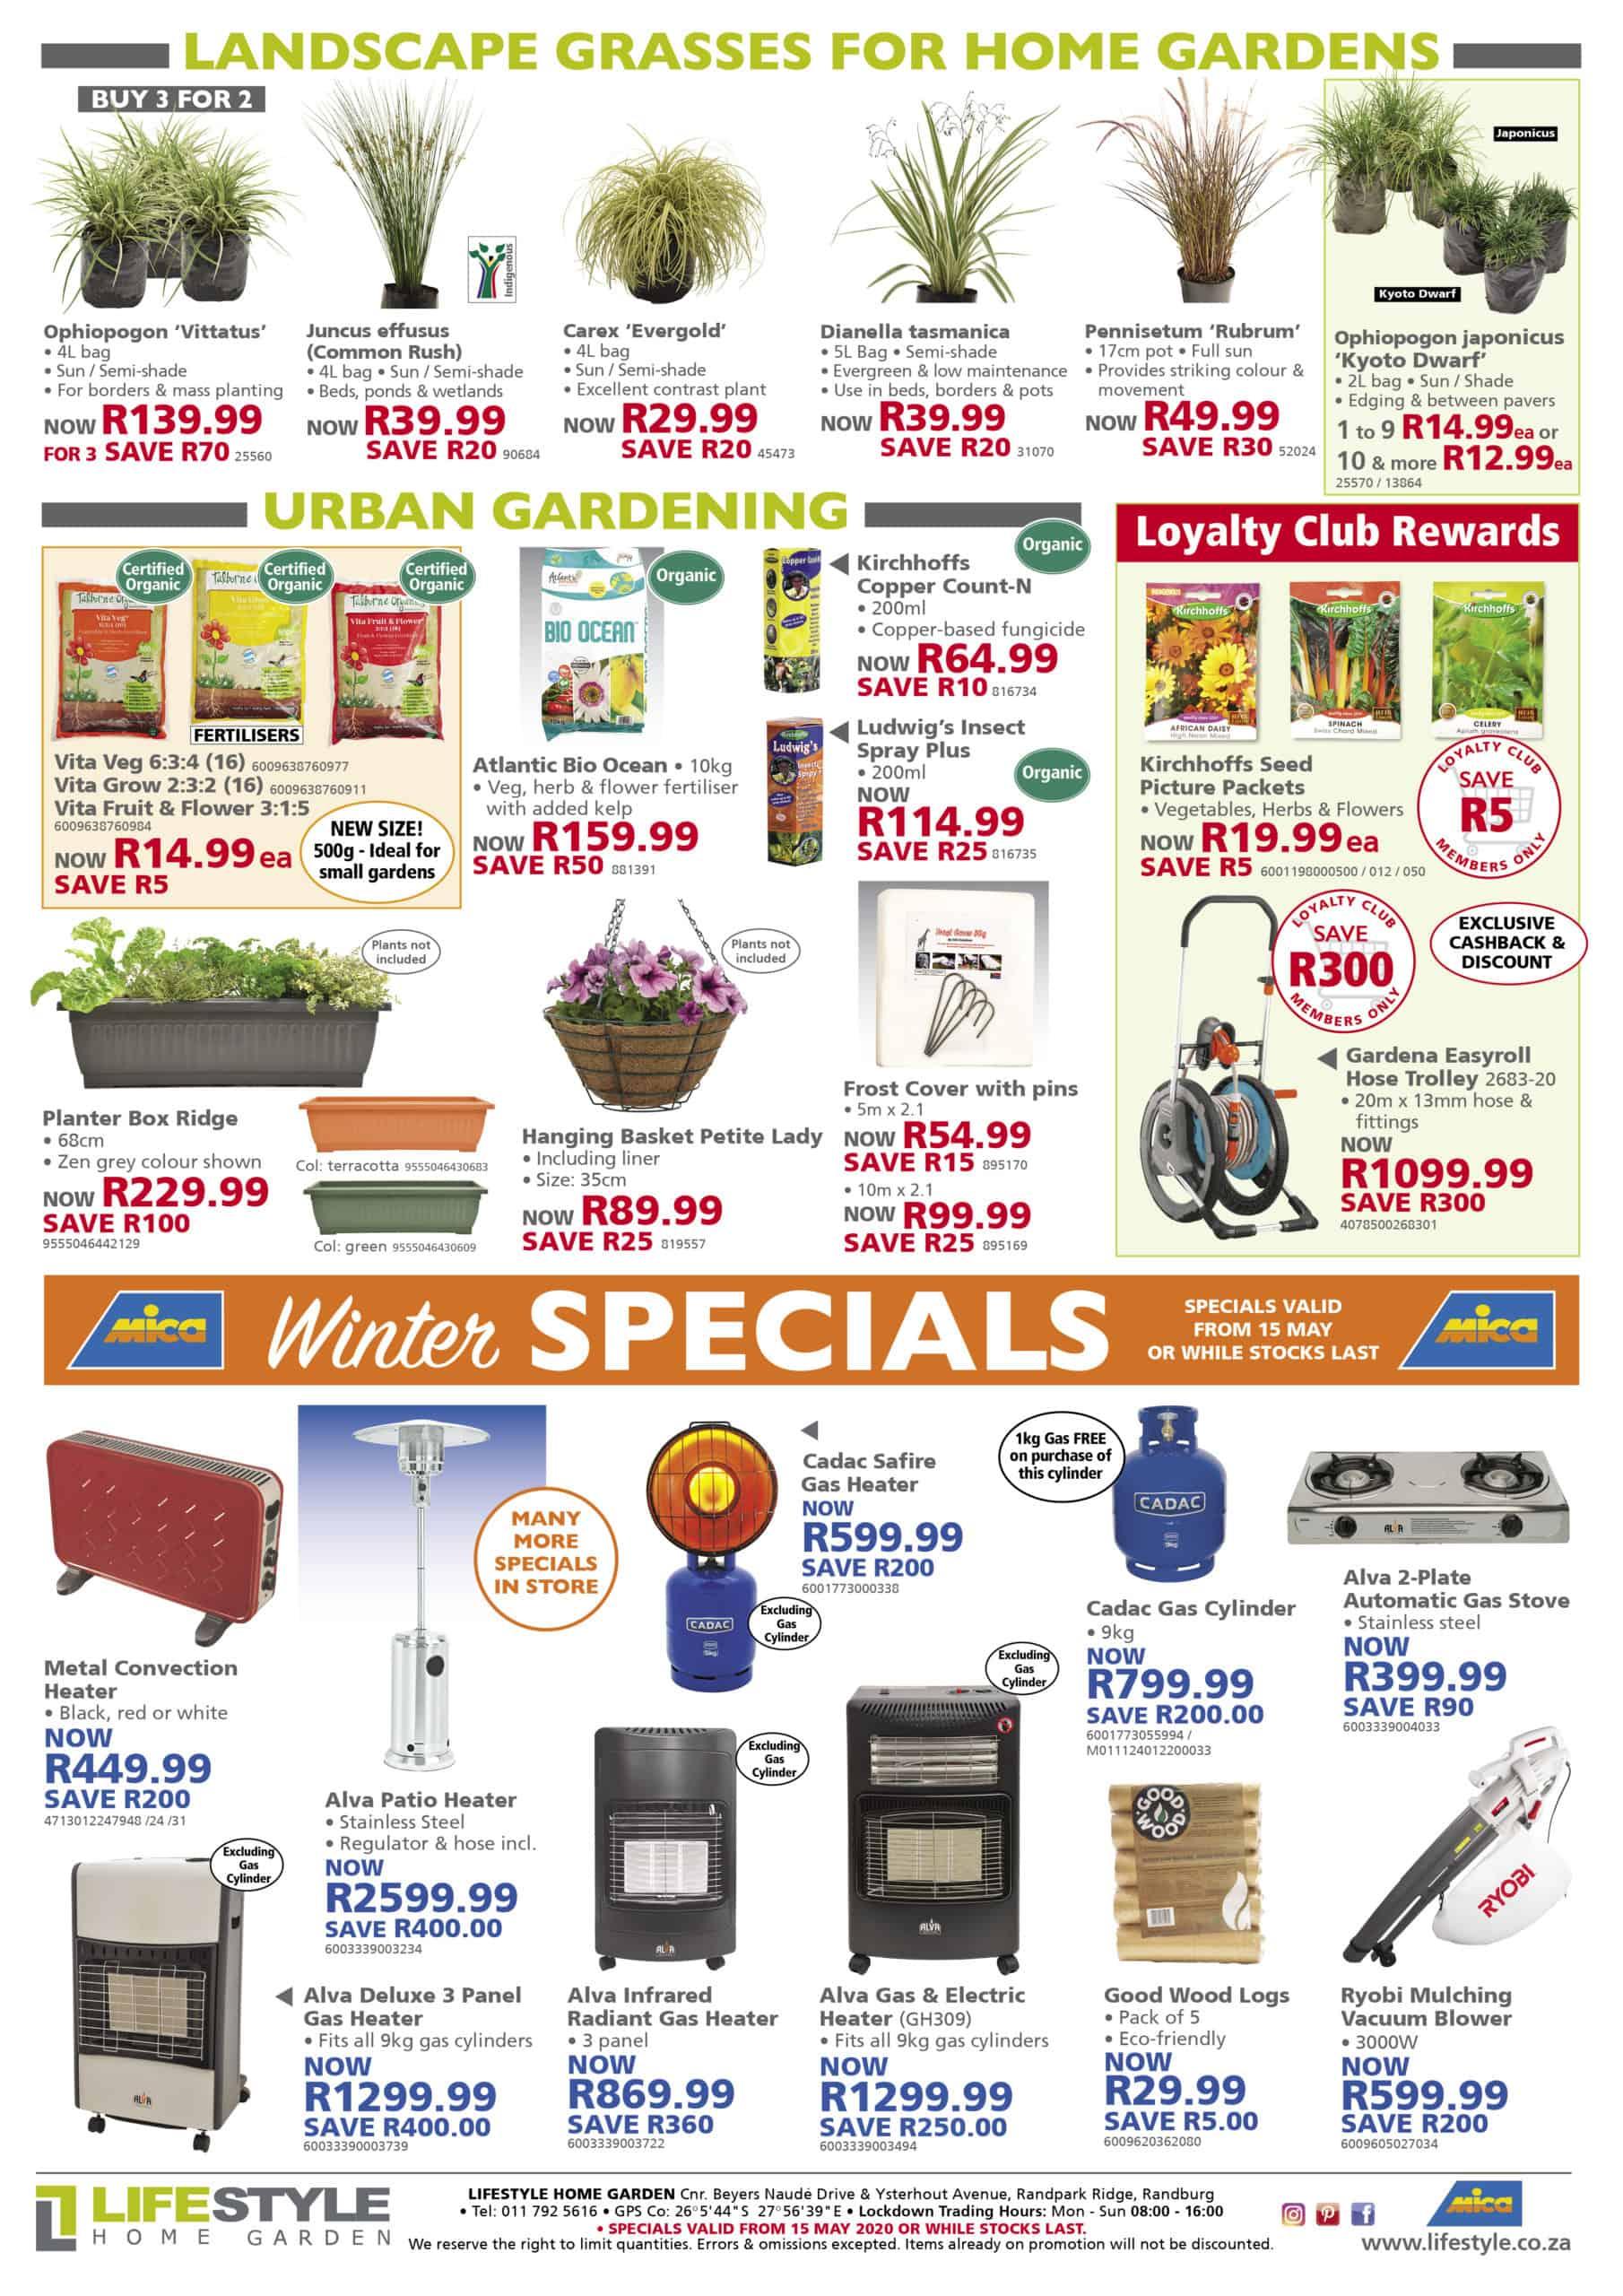 lifestyle home garden nursery plant shop combos value winter gardening specials johannesburg gauteng